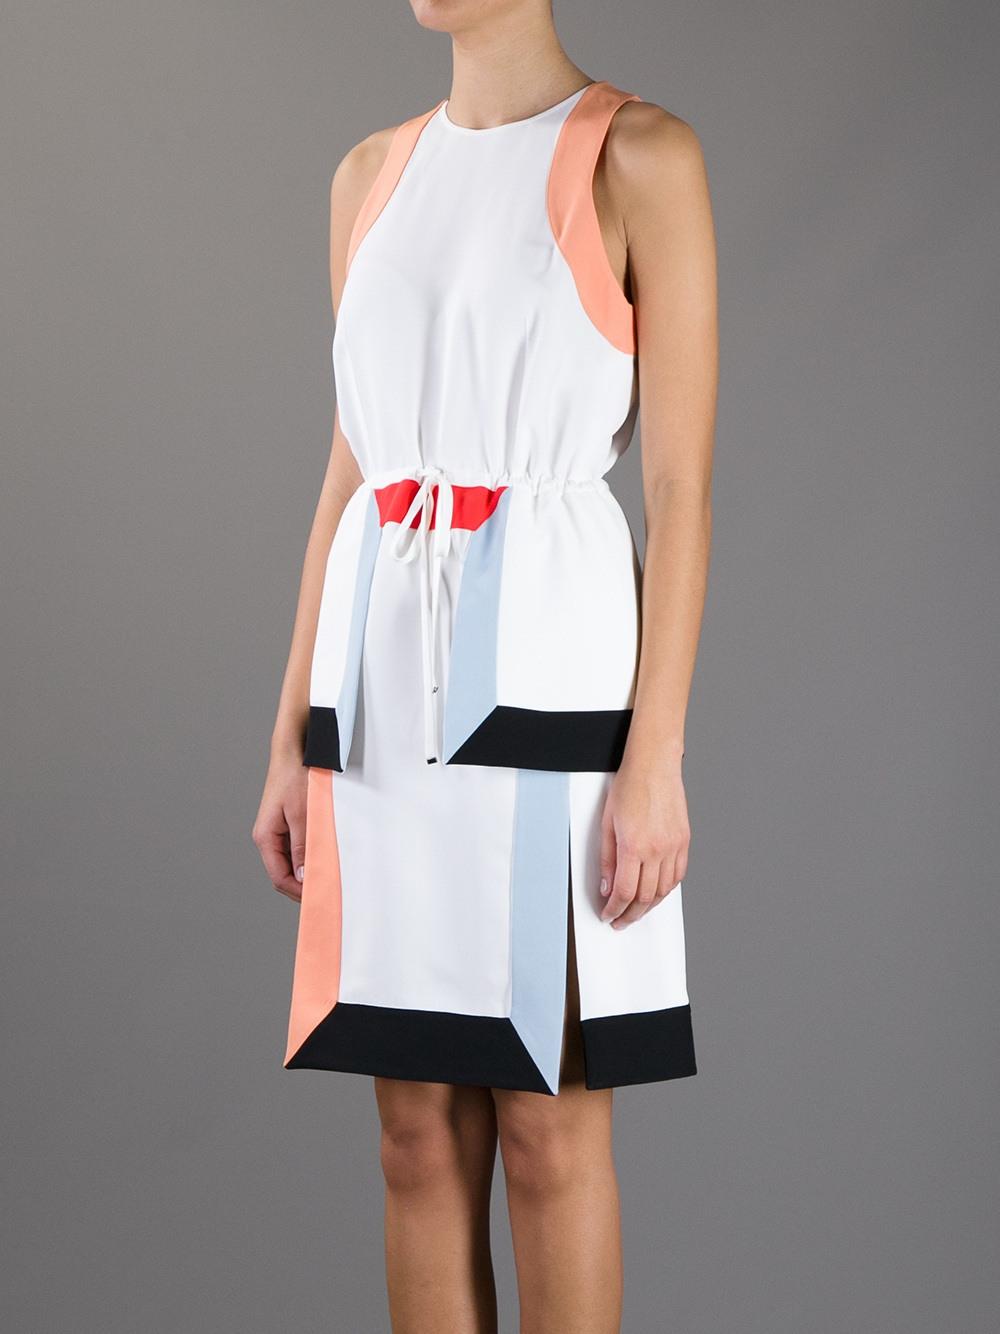 Lyst  Fendi Sleeveless Drawstring Dress In White